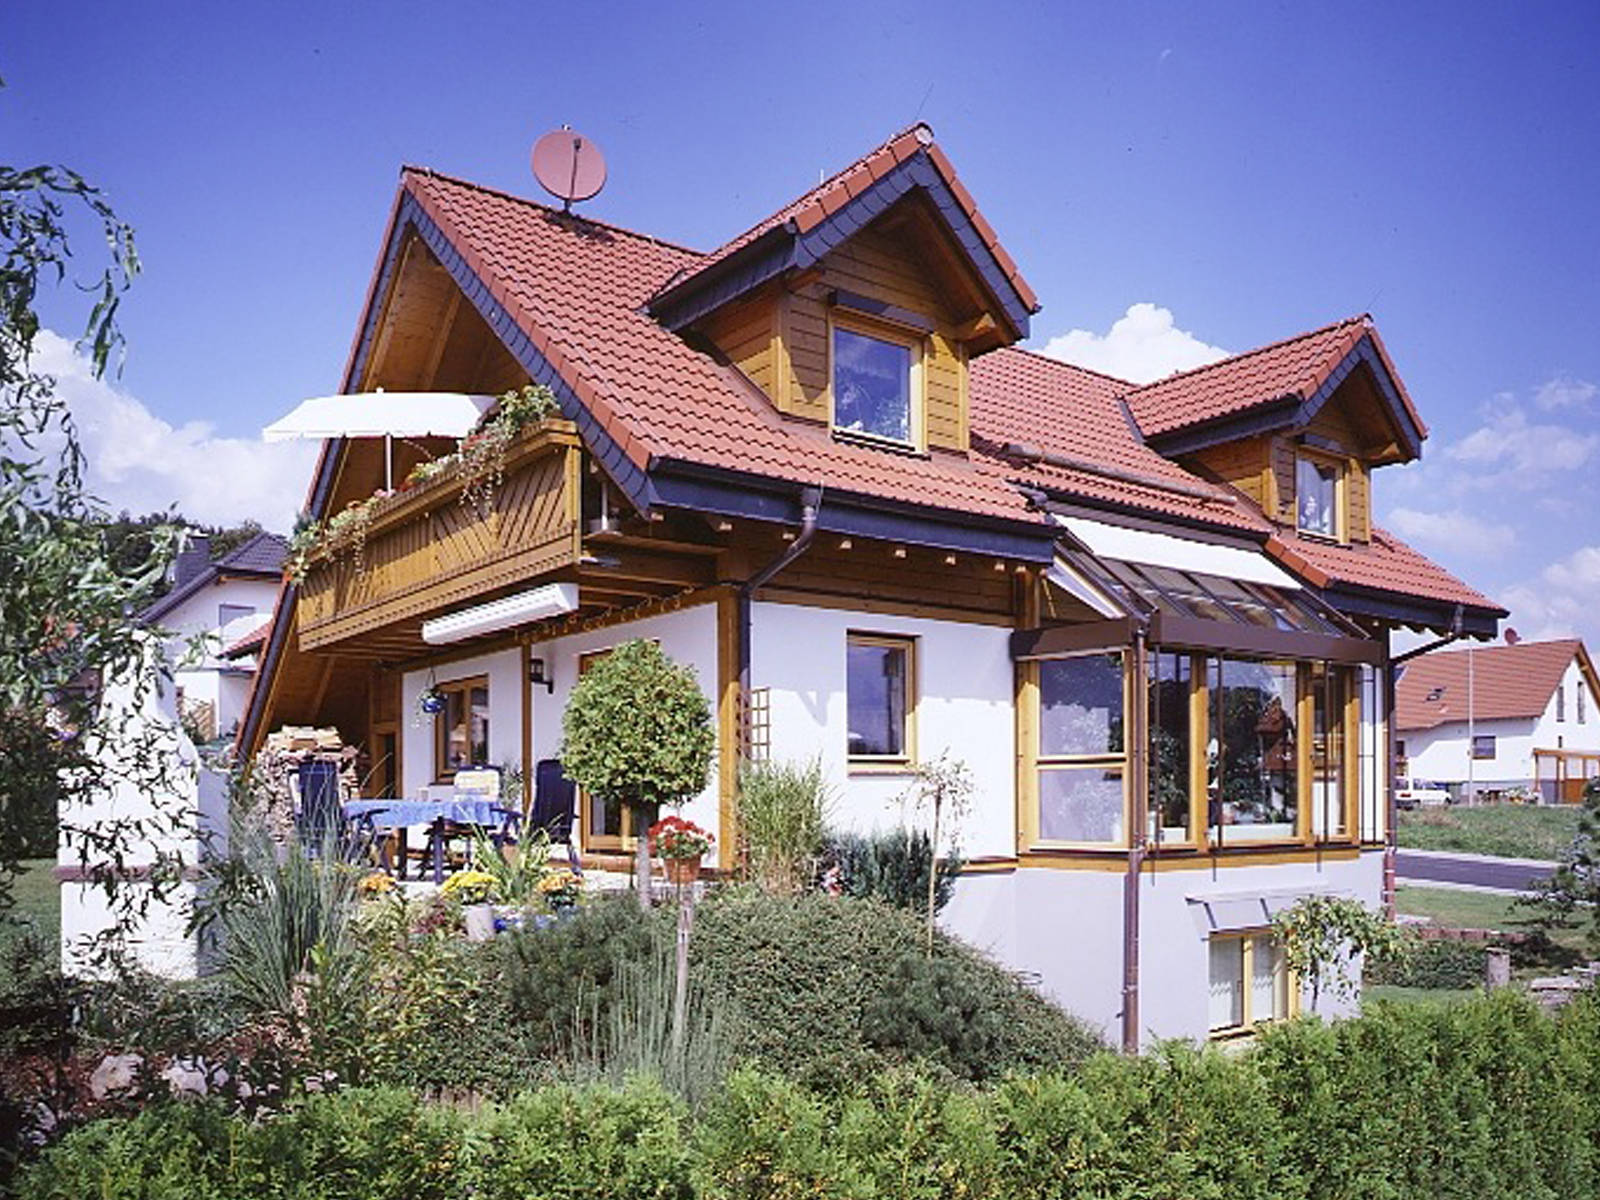 Haus-Idee K07 - Traditionell - Vöma-Bio-Bau | Musterhaus.net